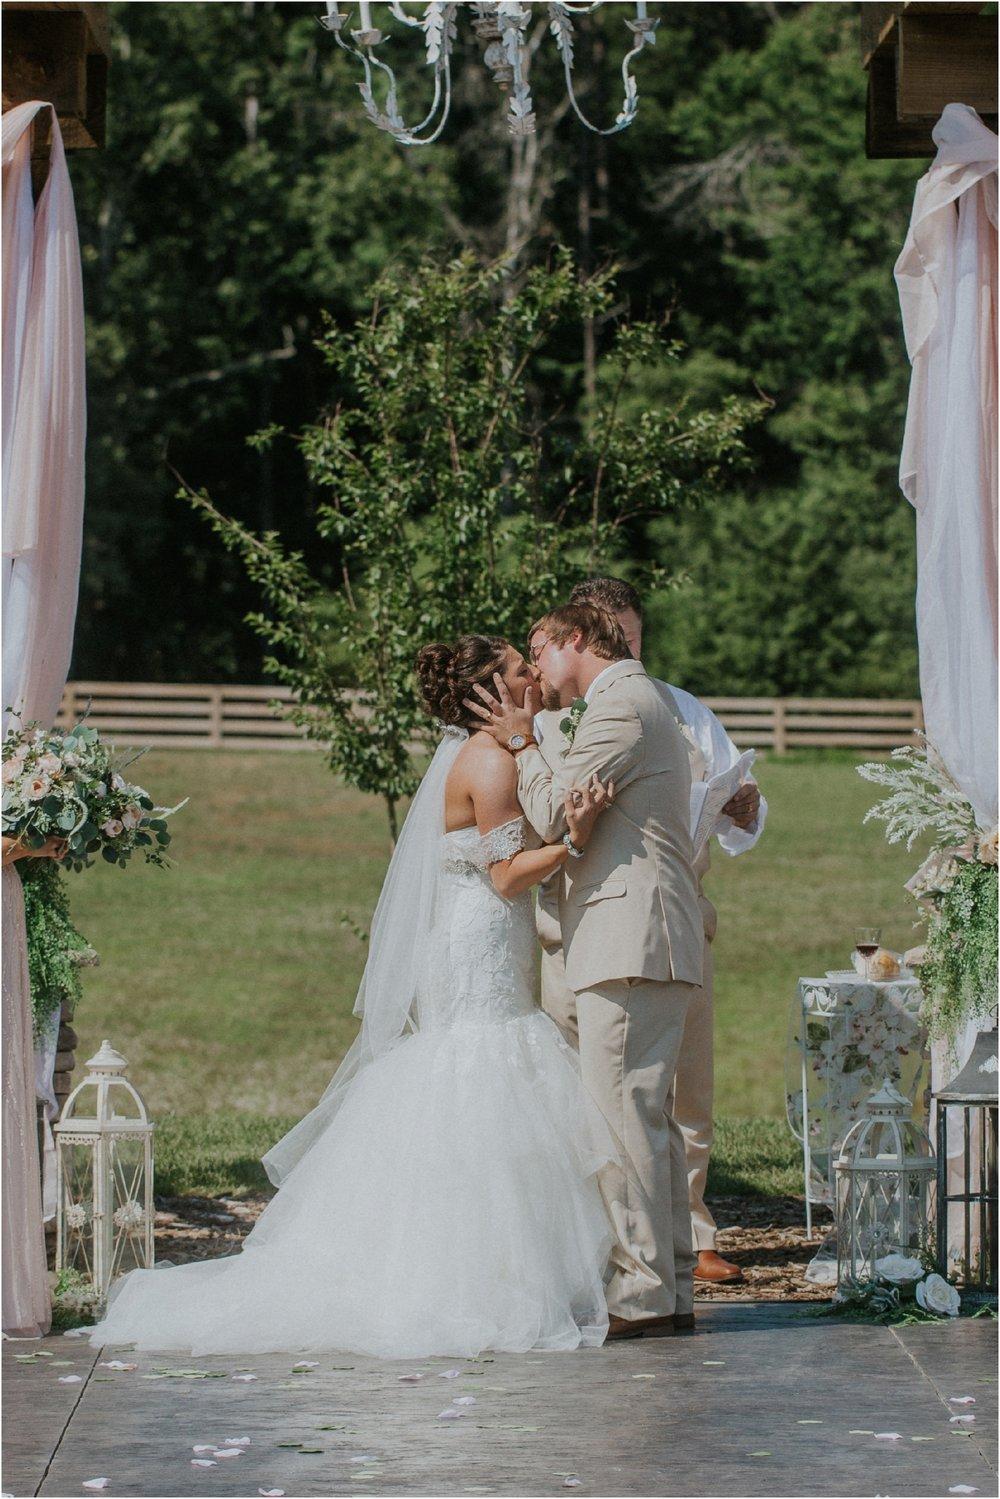 pink-rustic-apple-barn-howe-farms-elegant-summer-wedding-cleveland-tennessee-chattanooga-georgetown-tn_0126.jpg